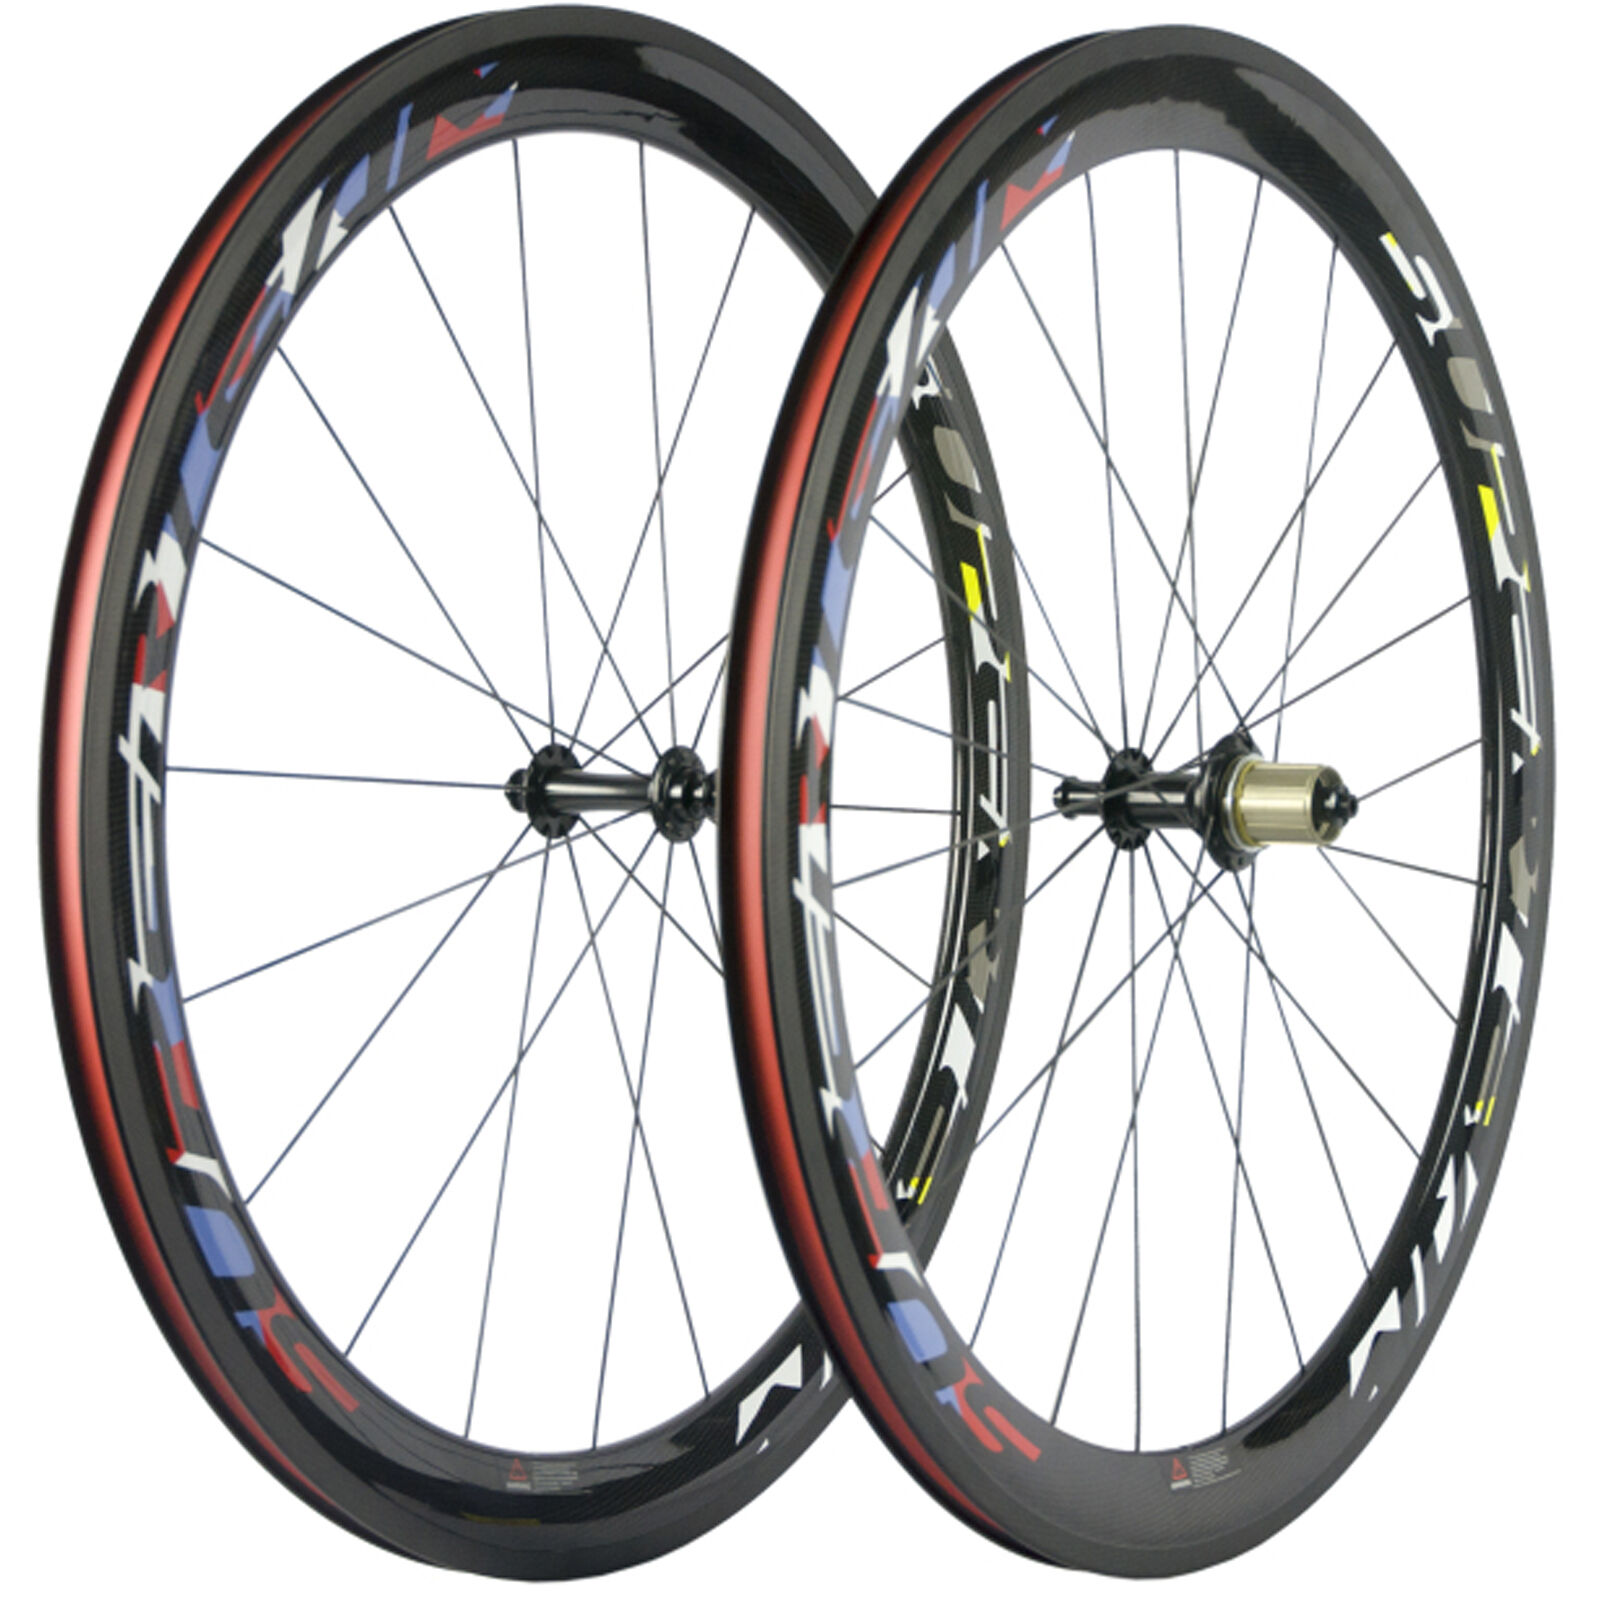 SUPERTEAM 50mm Carbon Clincher Wheelset Smith Hub Light 1420 Spokes Bike Wheels